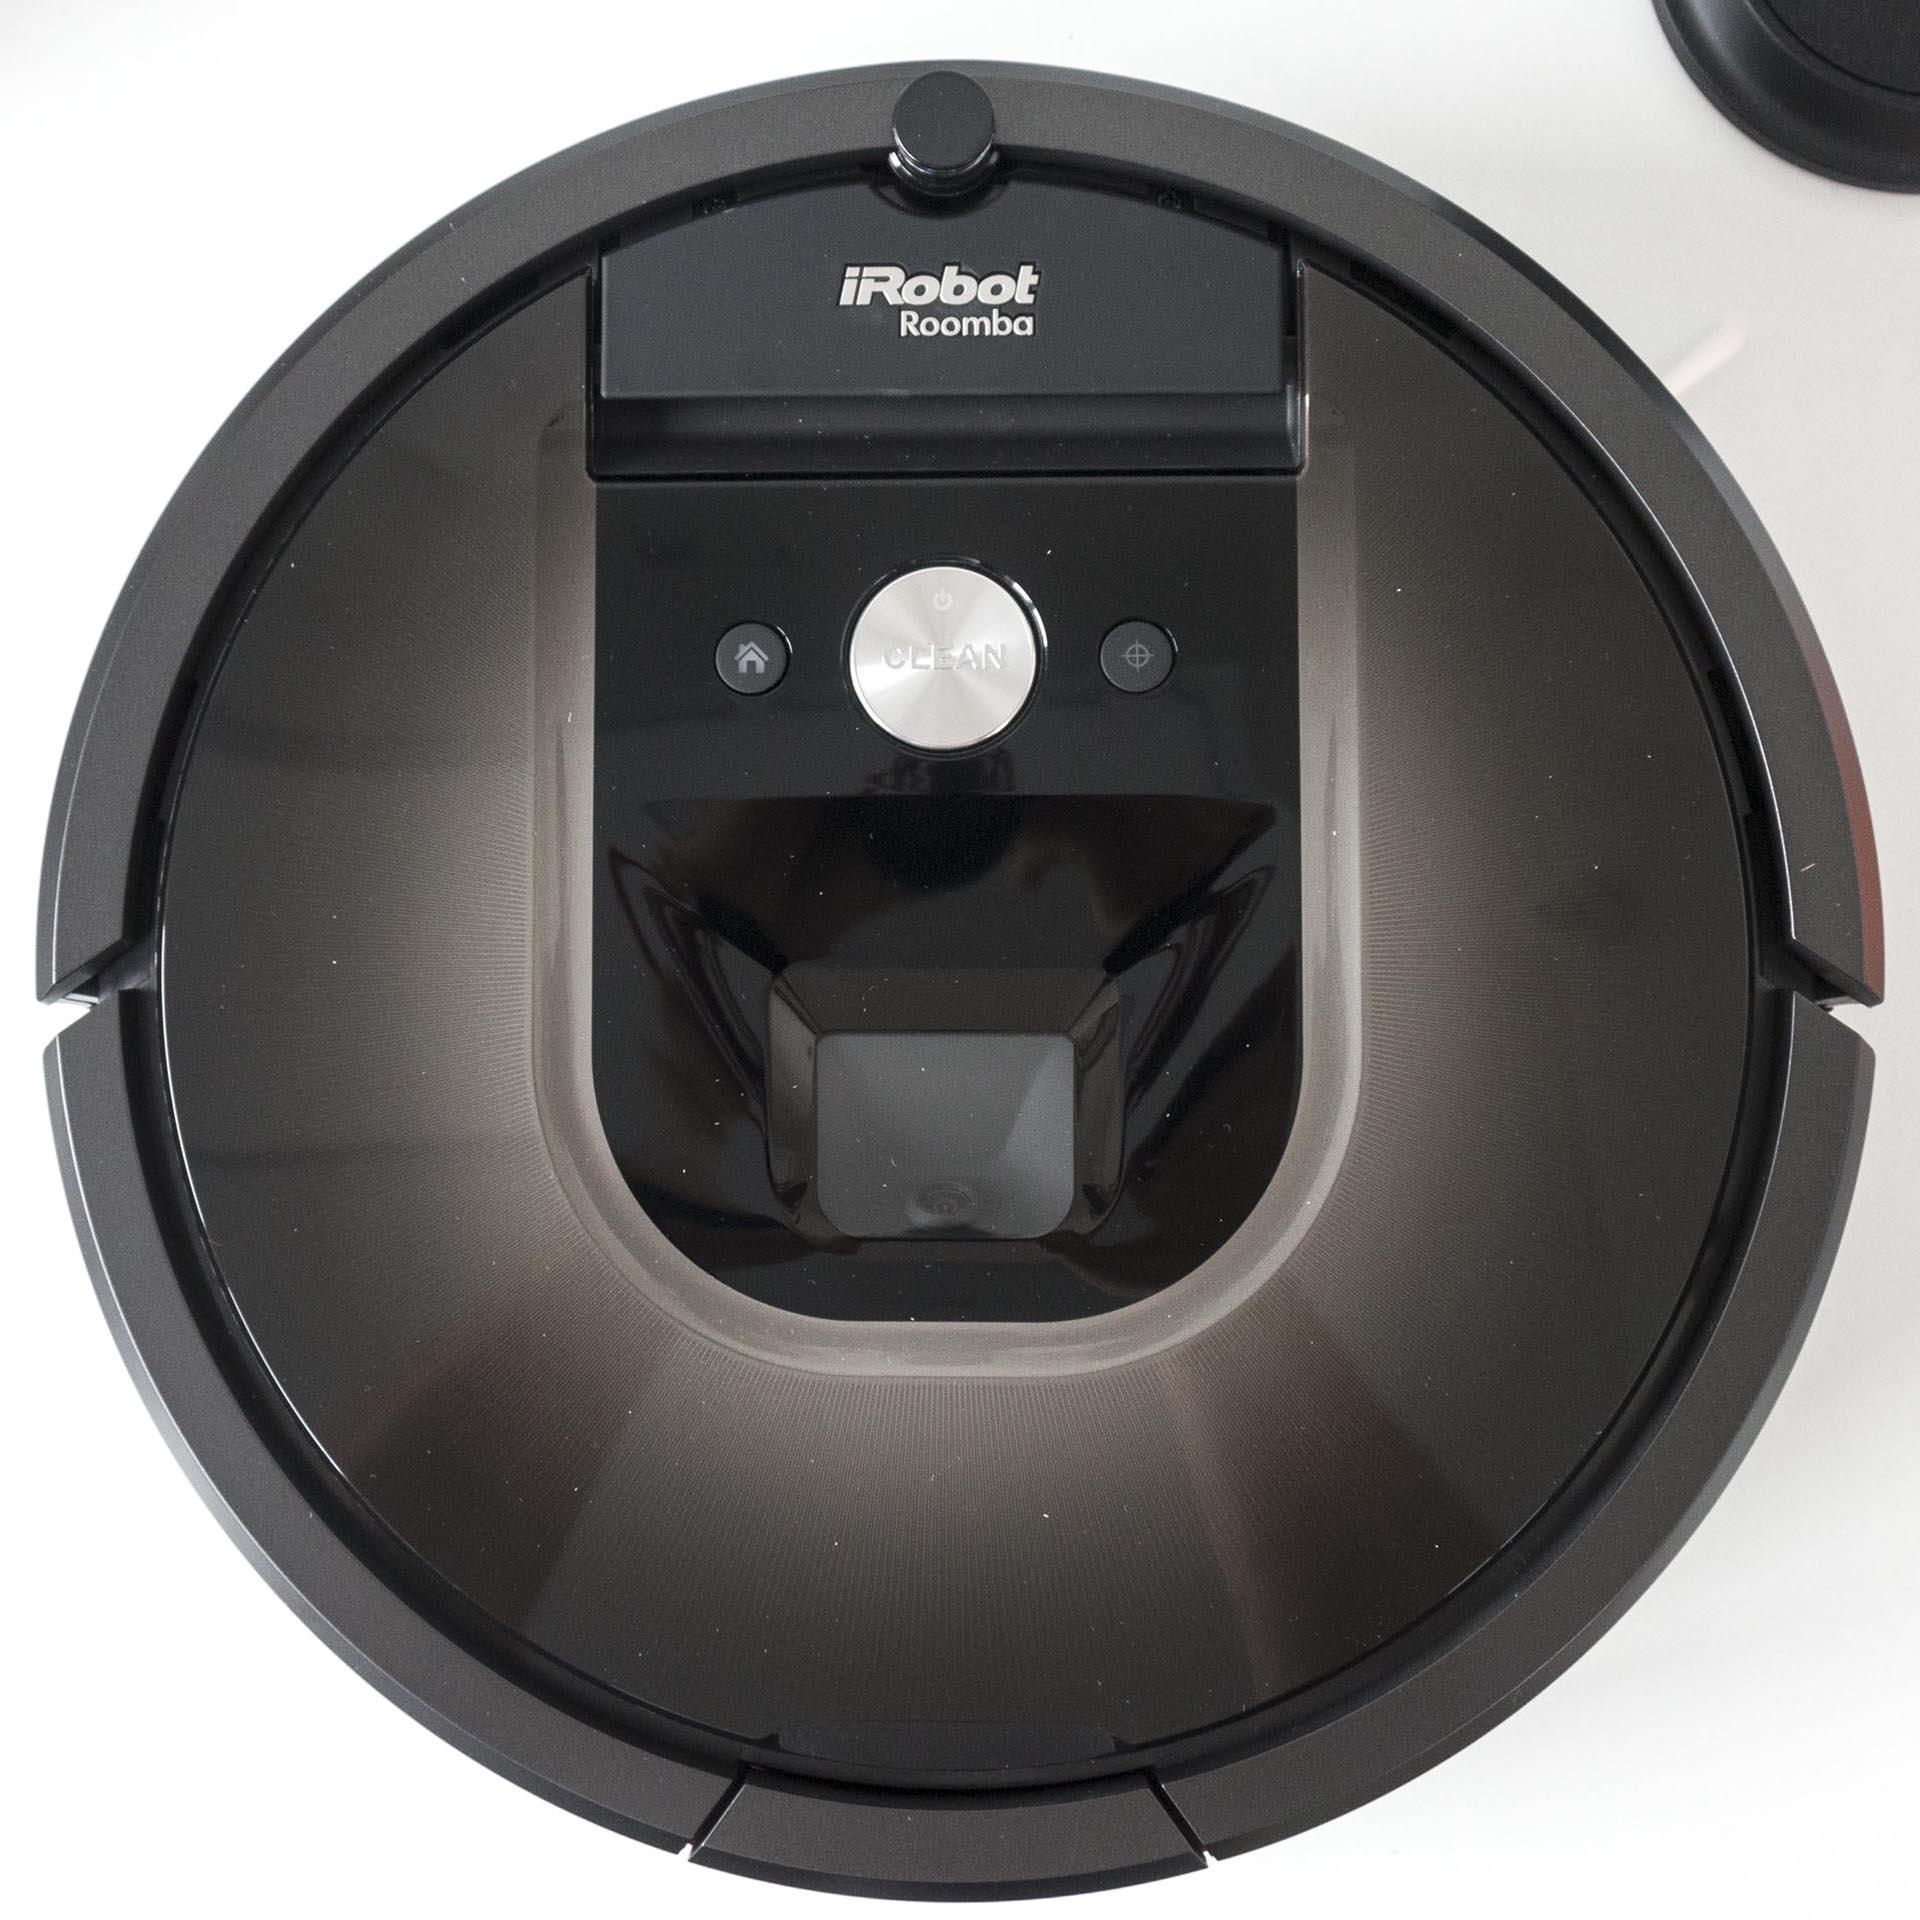 review irobot roomba 980. Black Bedroom Furniture Sets. Home Design Ideas